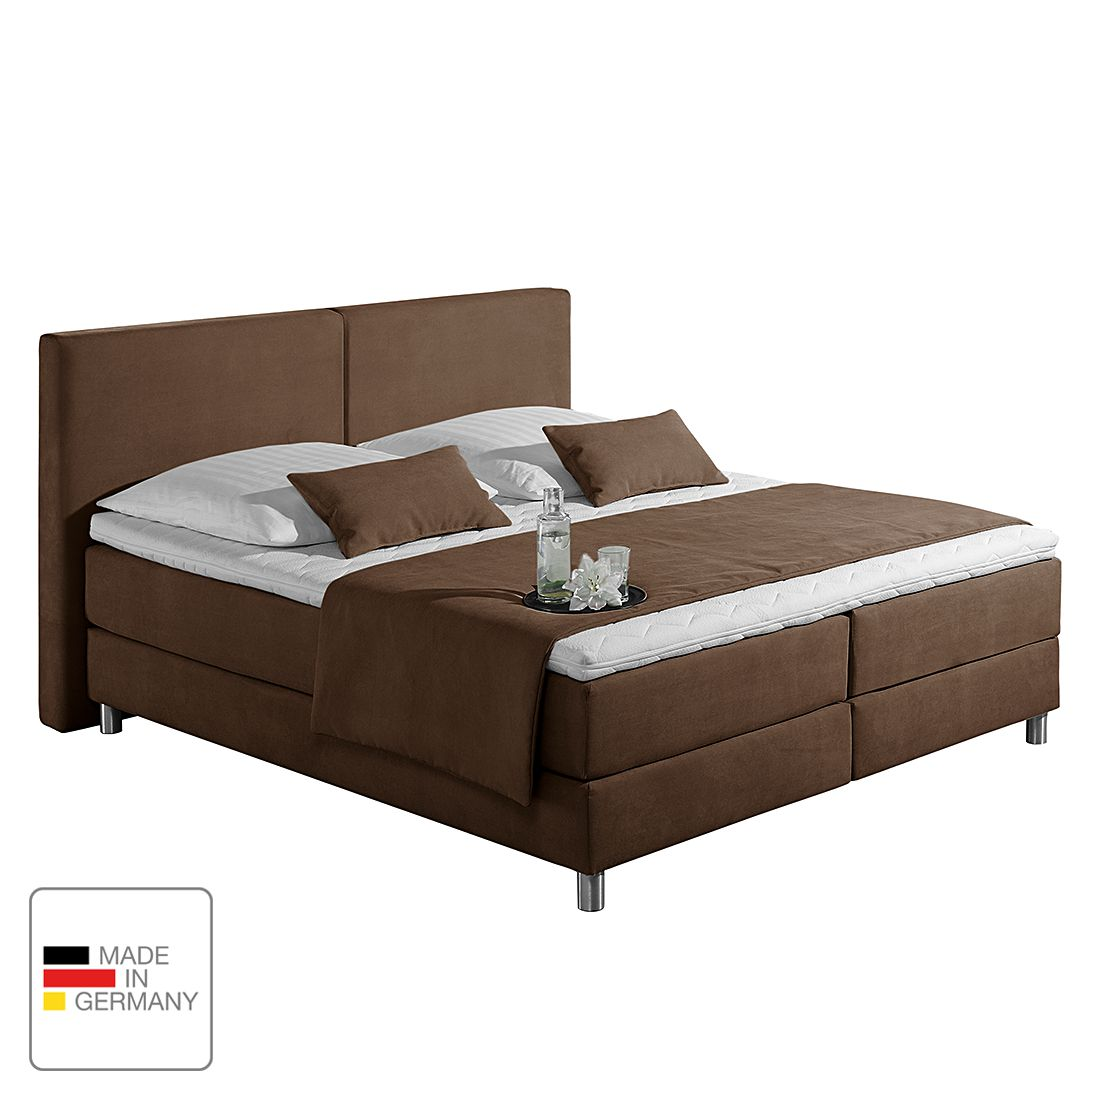 Boxspringbett Nilan - Webstoff - 180 x 200cm - H2 bis 80 kg - Kaltschaummatratze - Schokoladenbraun, Monaco